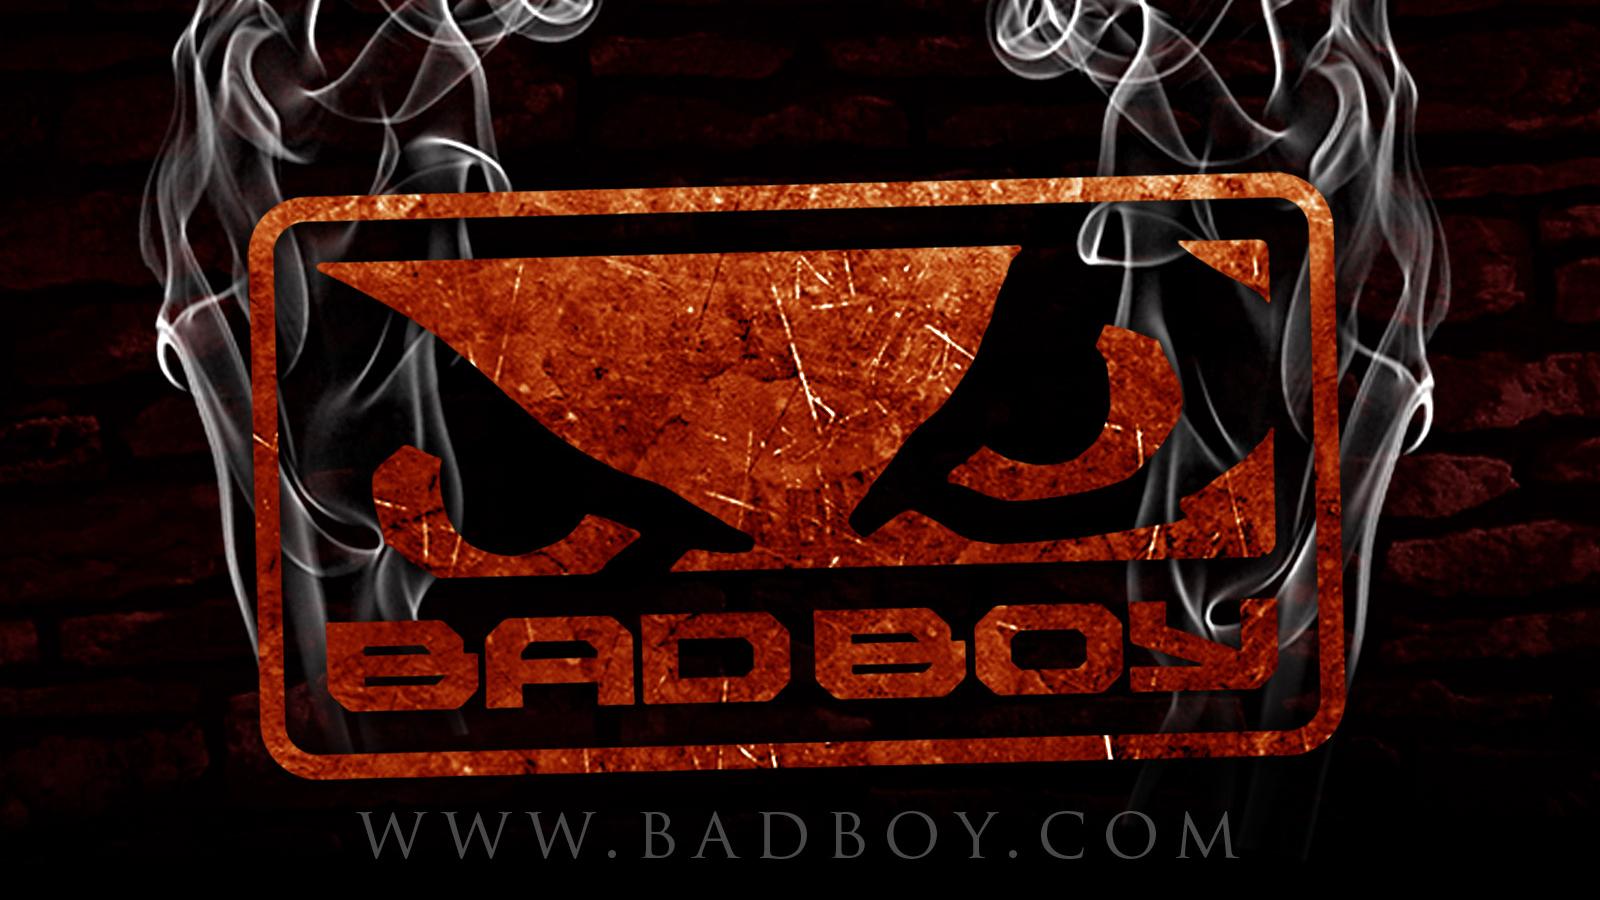 Free download Bad Boys Logo Here is bad boy mma wallpaper